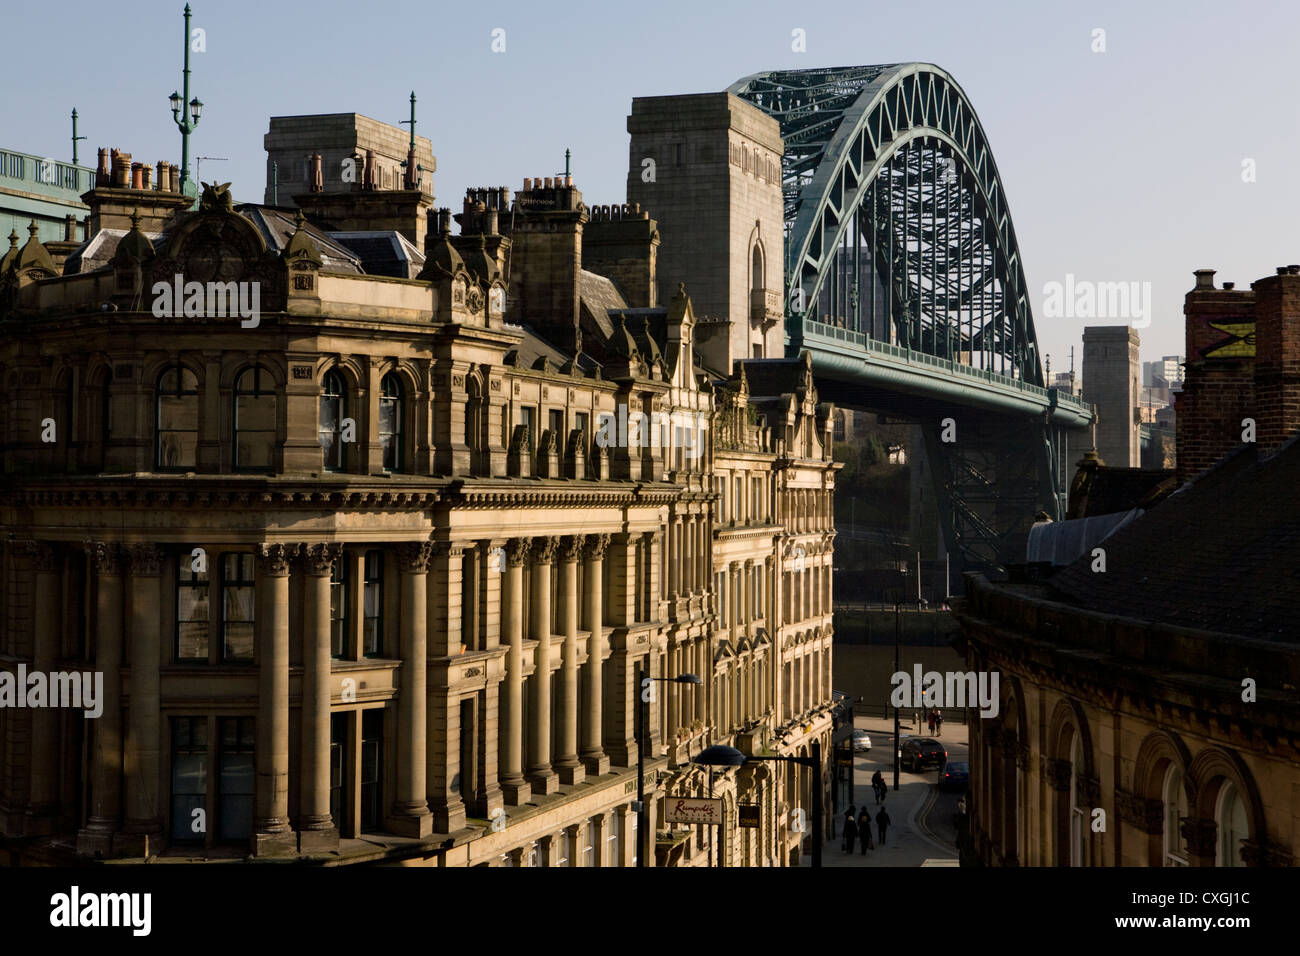 Newcastle upon Tyne's iconic Quayside and Tyne Bridge Stock Photo